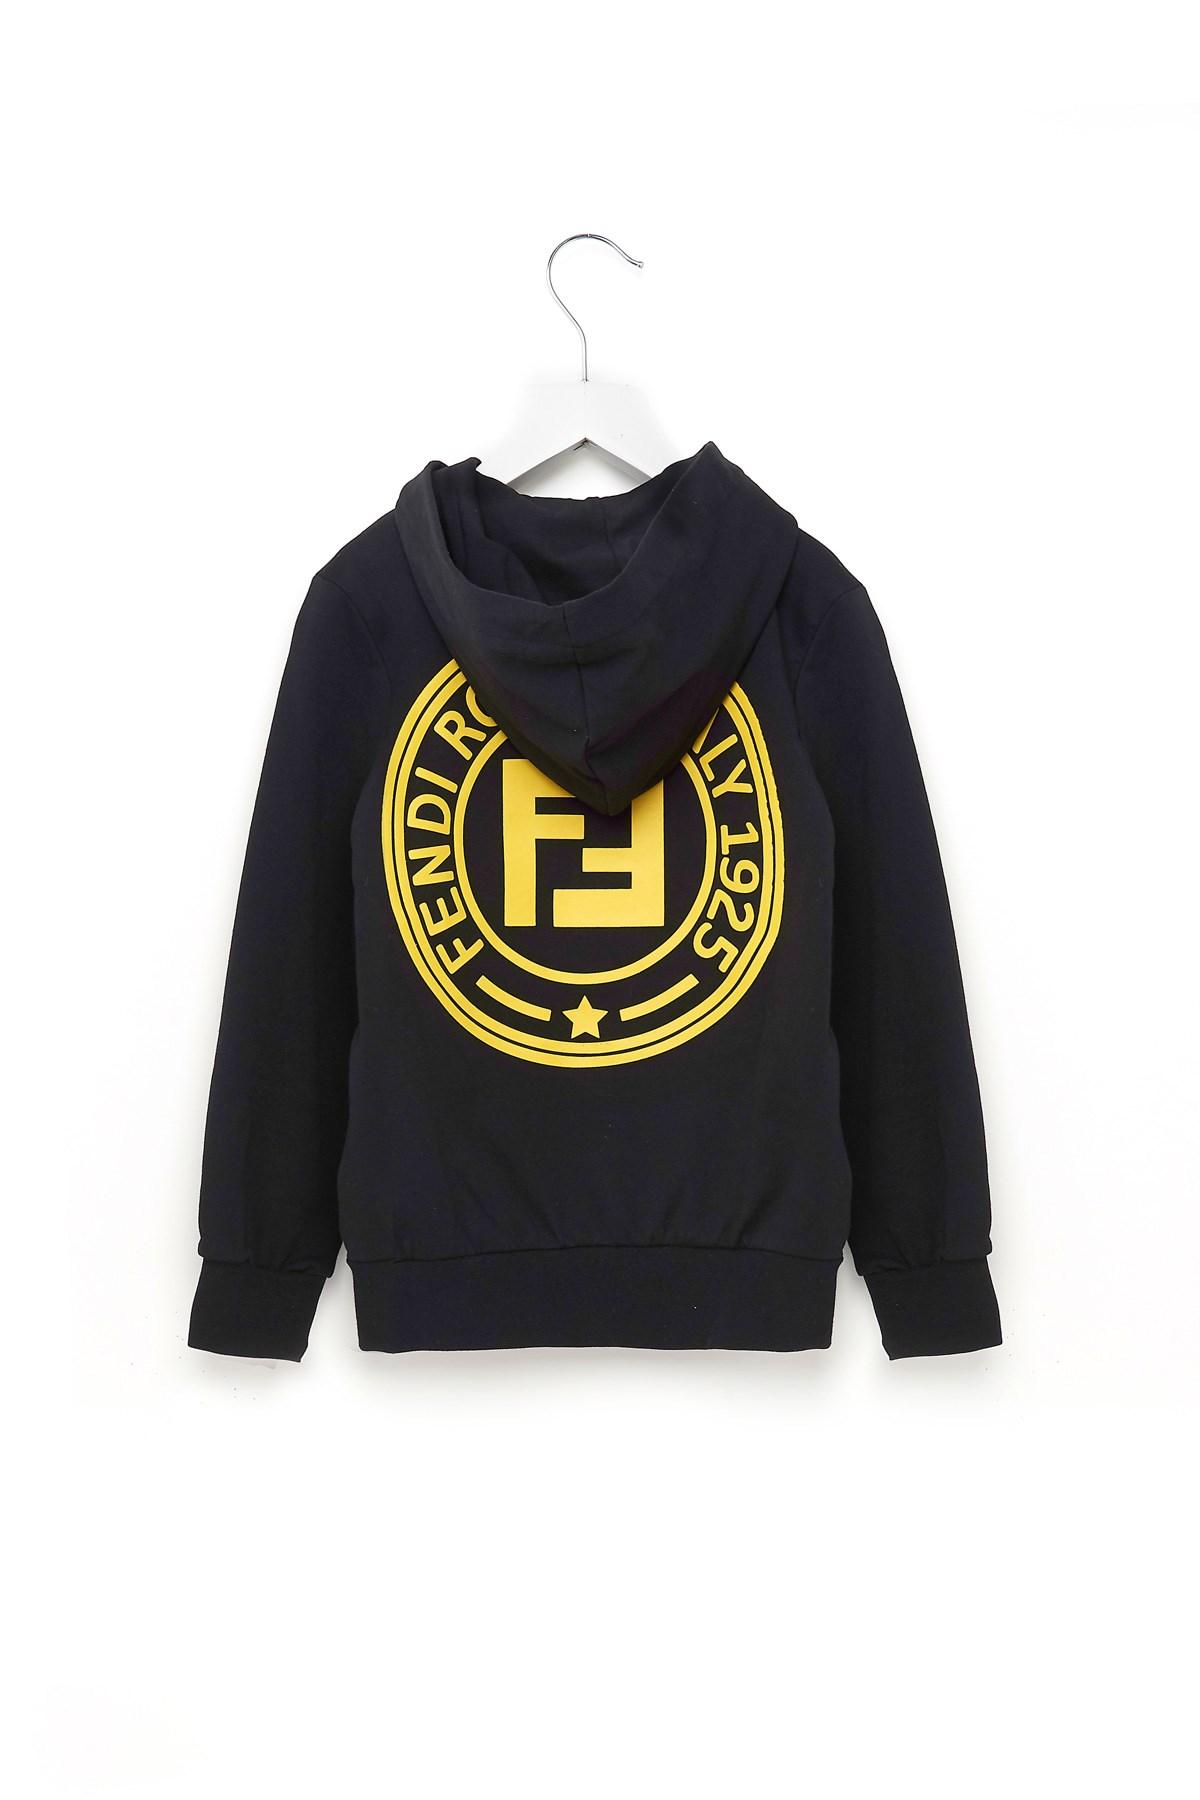 fendi kids logo hoodie available on julian-fashion.com - 56771 3bb55c7193ca